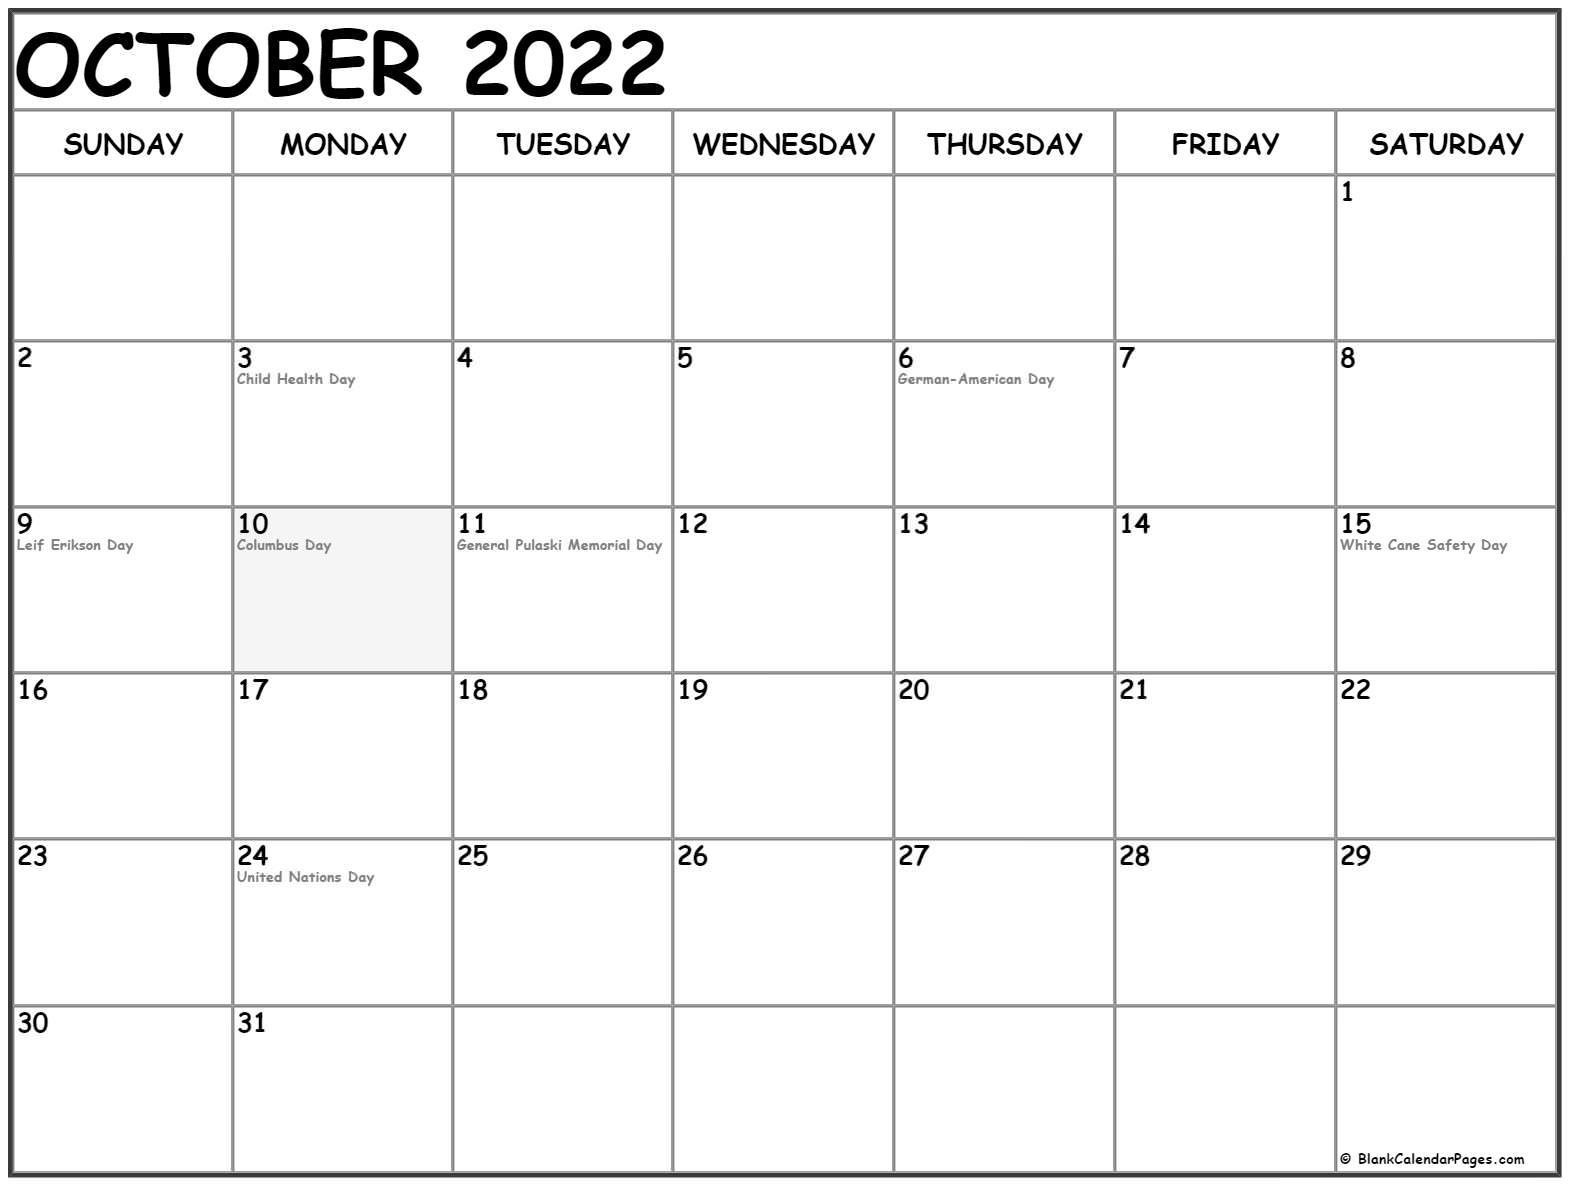 October 2022 Calendar With Holidays.October 2022 With Holidays Calendar